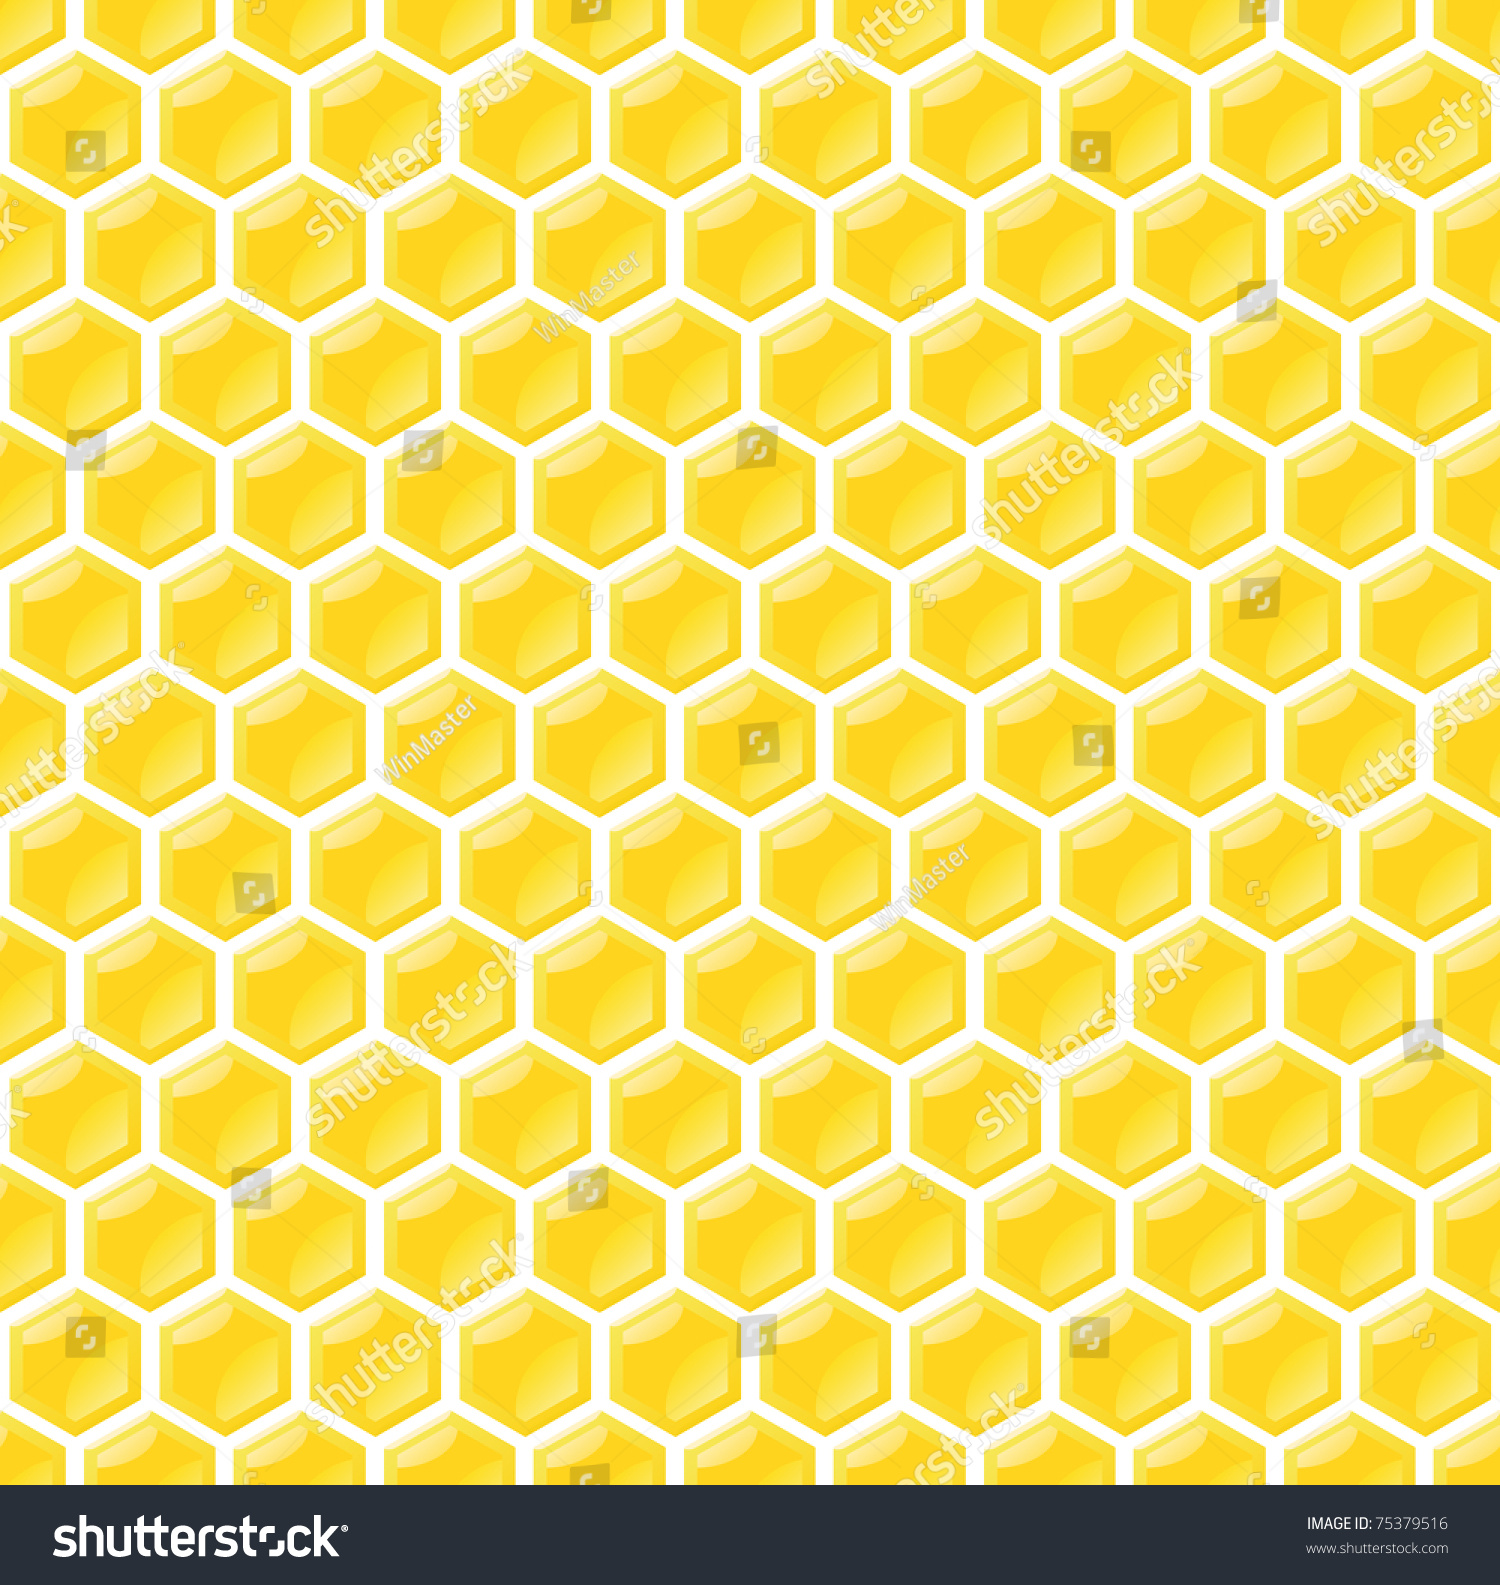 Seamless Honeycomb Pattern Stock Vector Illustration ...